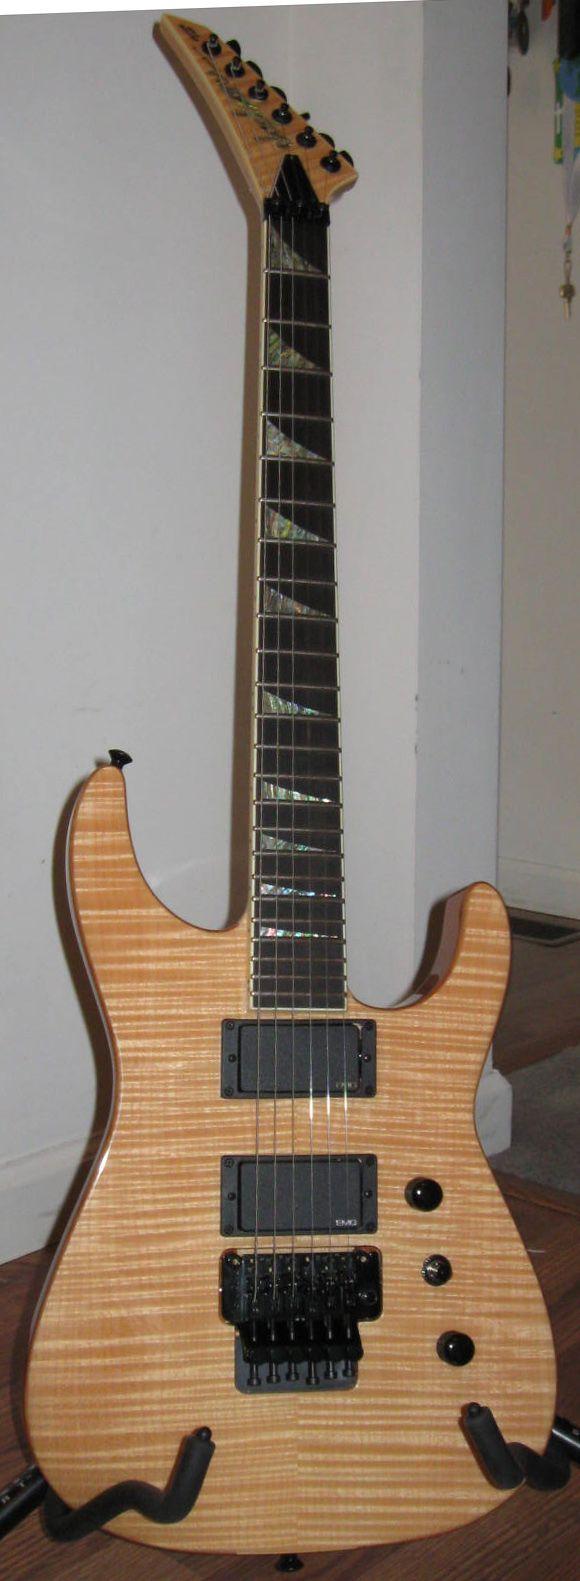 Jackson Custom Shop 5A Flame Natural & 35 best Slicku0027s Guitars - Jackson Guitars images on Pinterest ... islam-shia.org